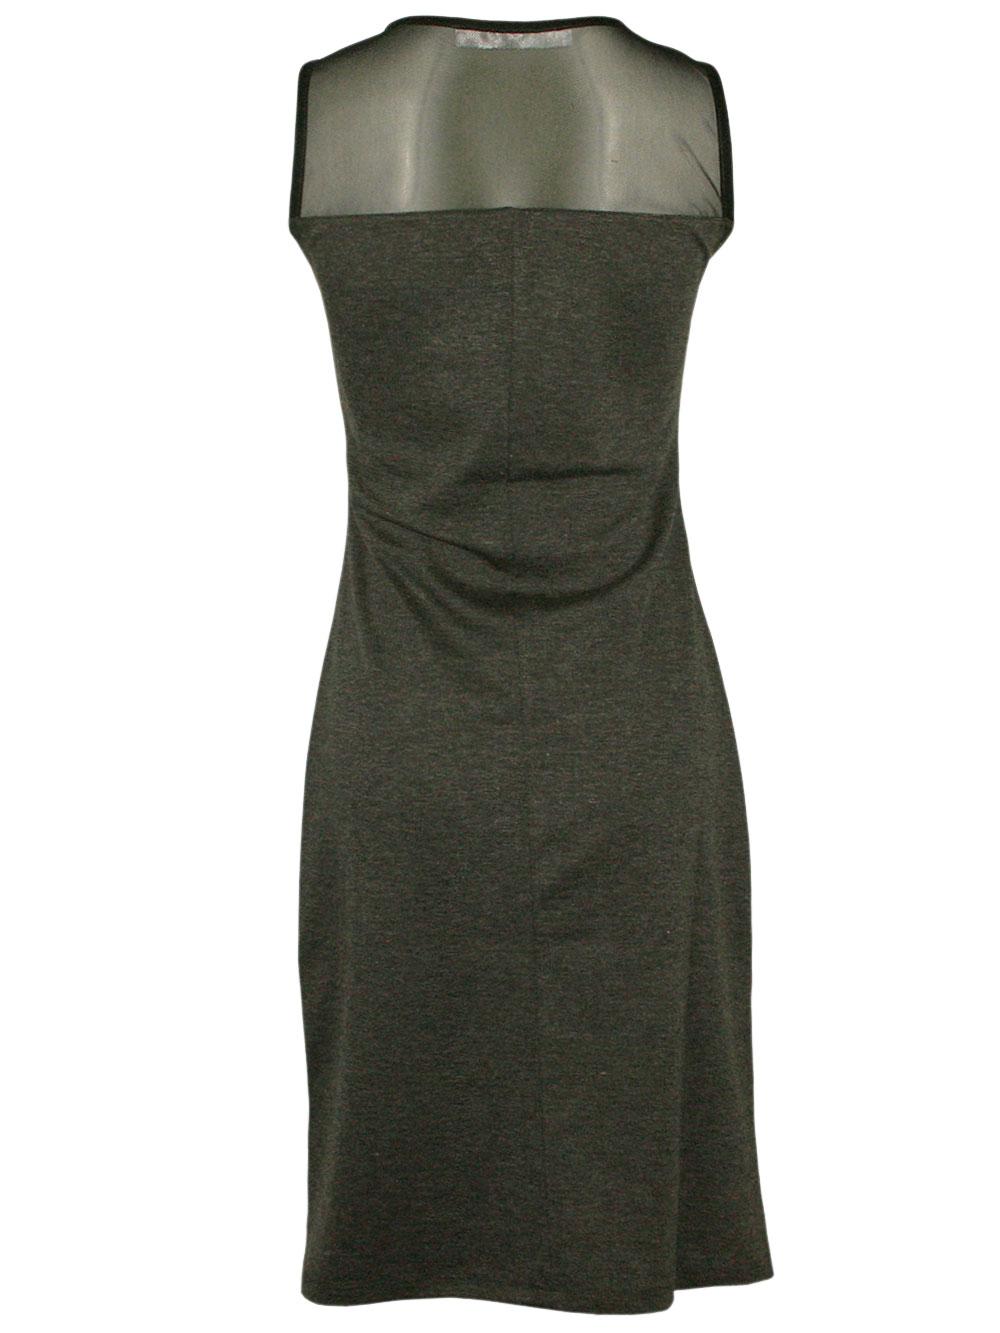 stylisches desigual damen designer dress kleid margaret in glaciar grey grau ebay. Black Bedroom Furniture Sets. Home Design Ideas